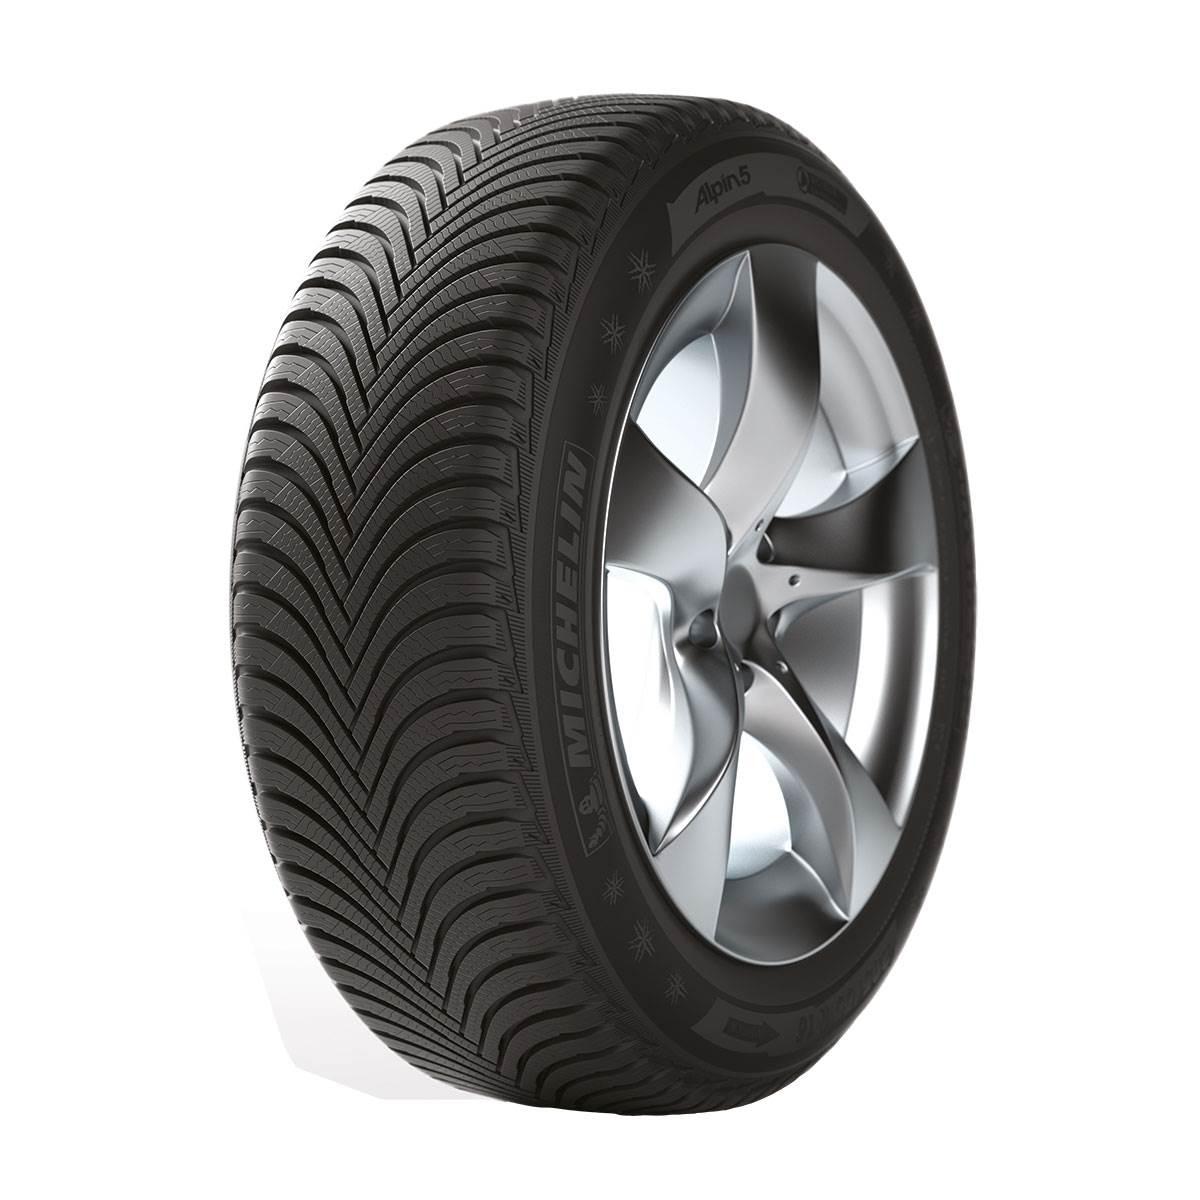 Pneu Hiver Michelin 205/55R16 91T Alpin A5